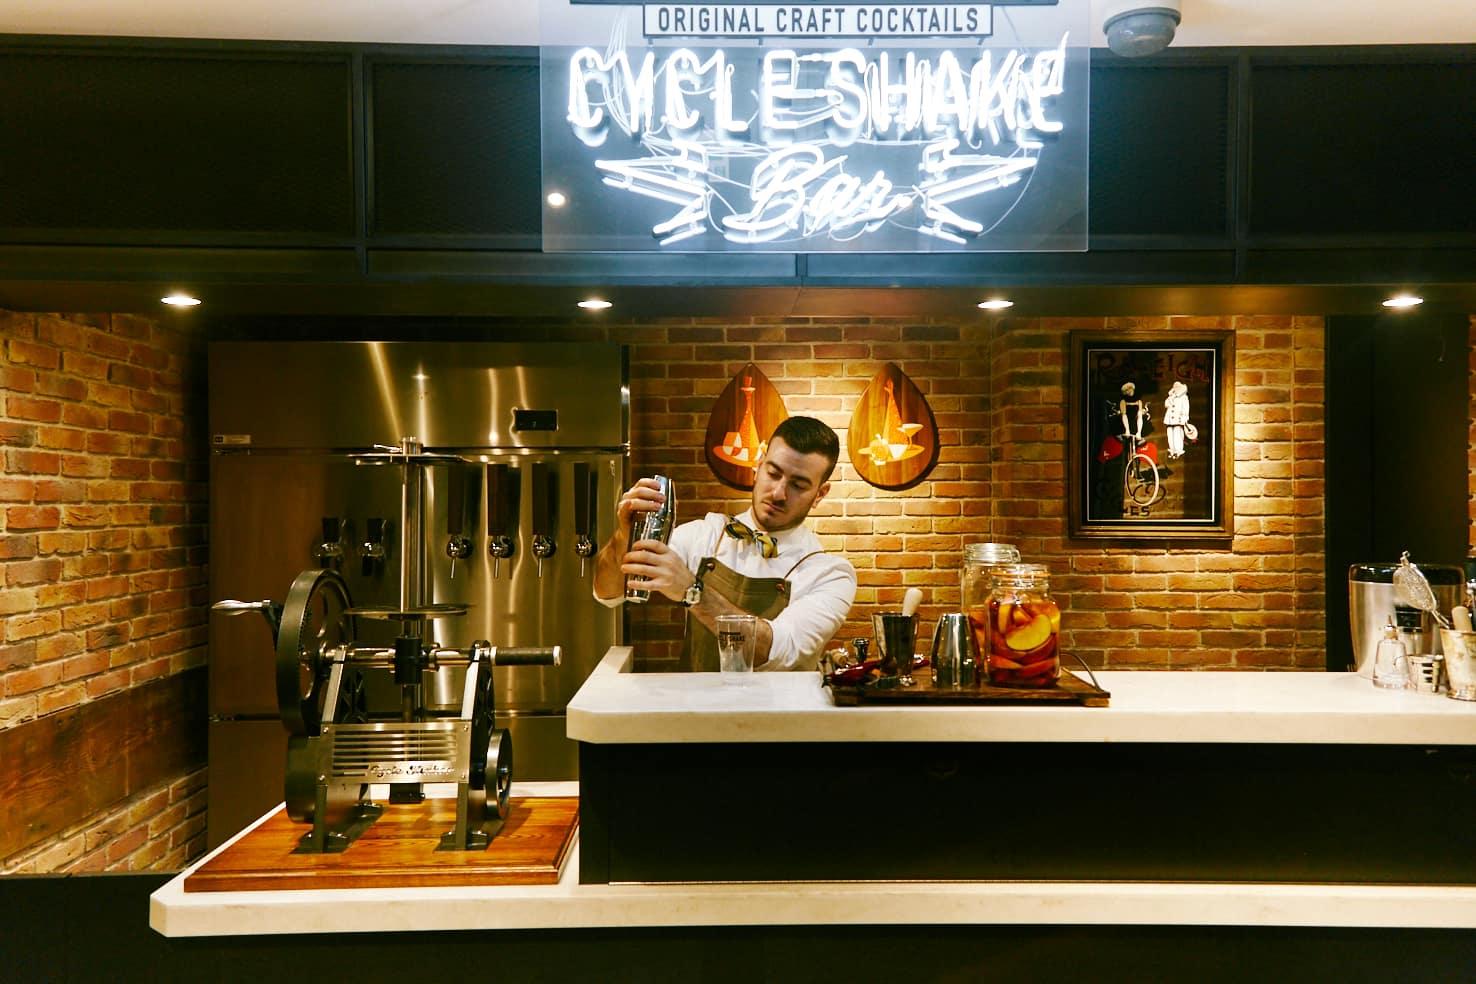 J.S.BURGERS CAFE CYCLE SHAKE BAR 新宿店 かき氷 カクテル 登場